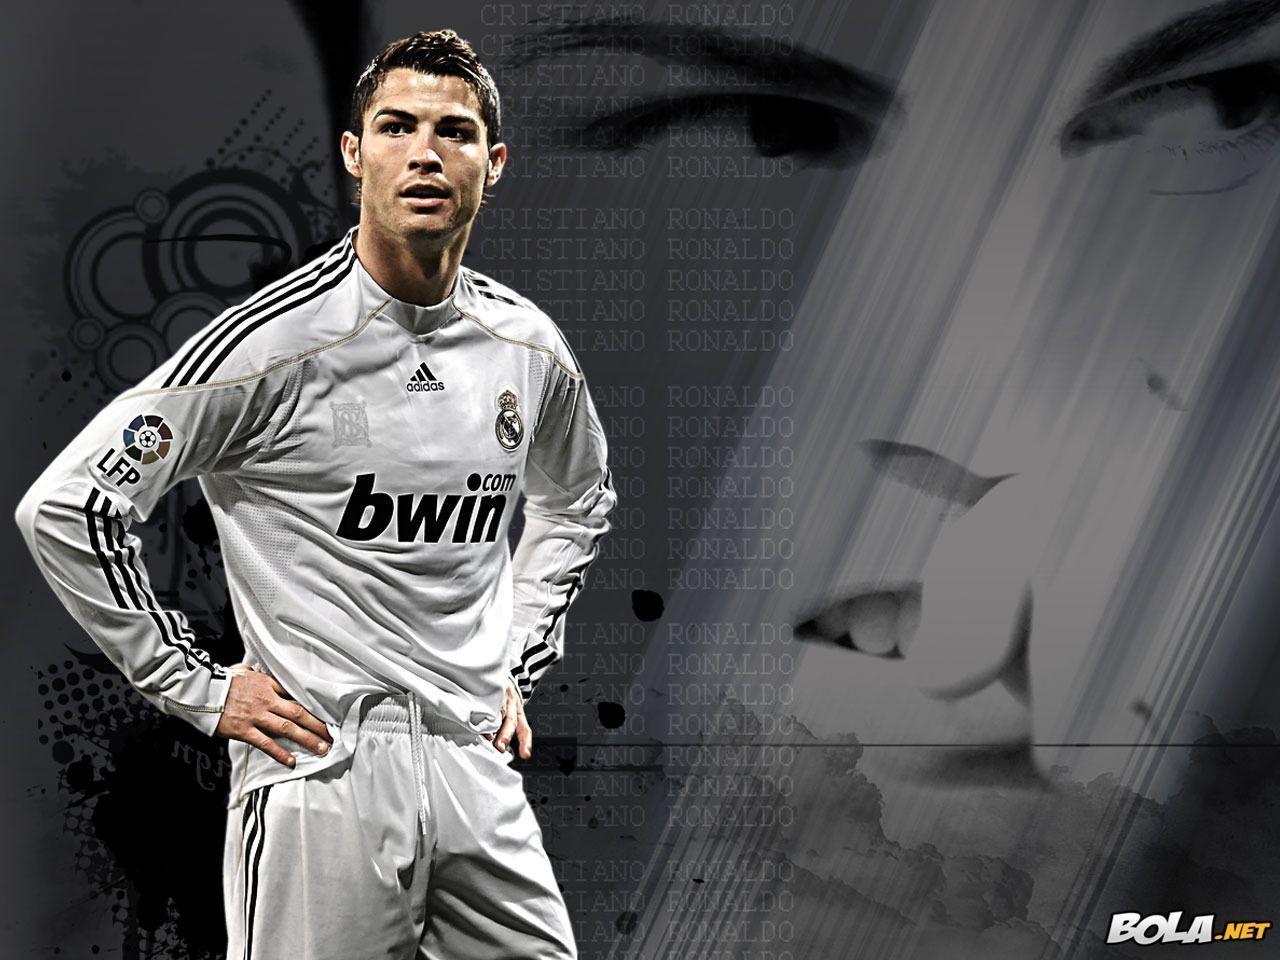 Cristiano Ronaldo HD Wallpapers 2015 - Sports Look